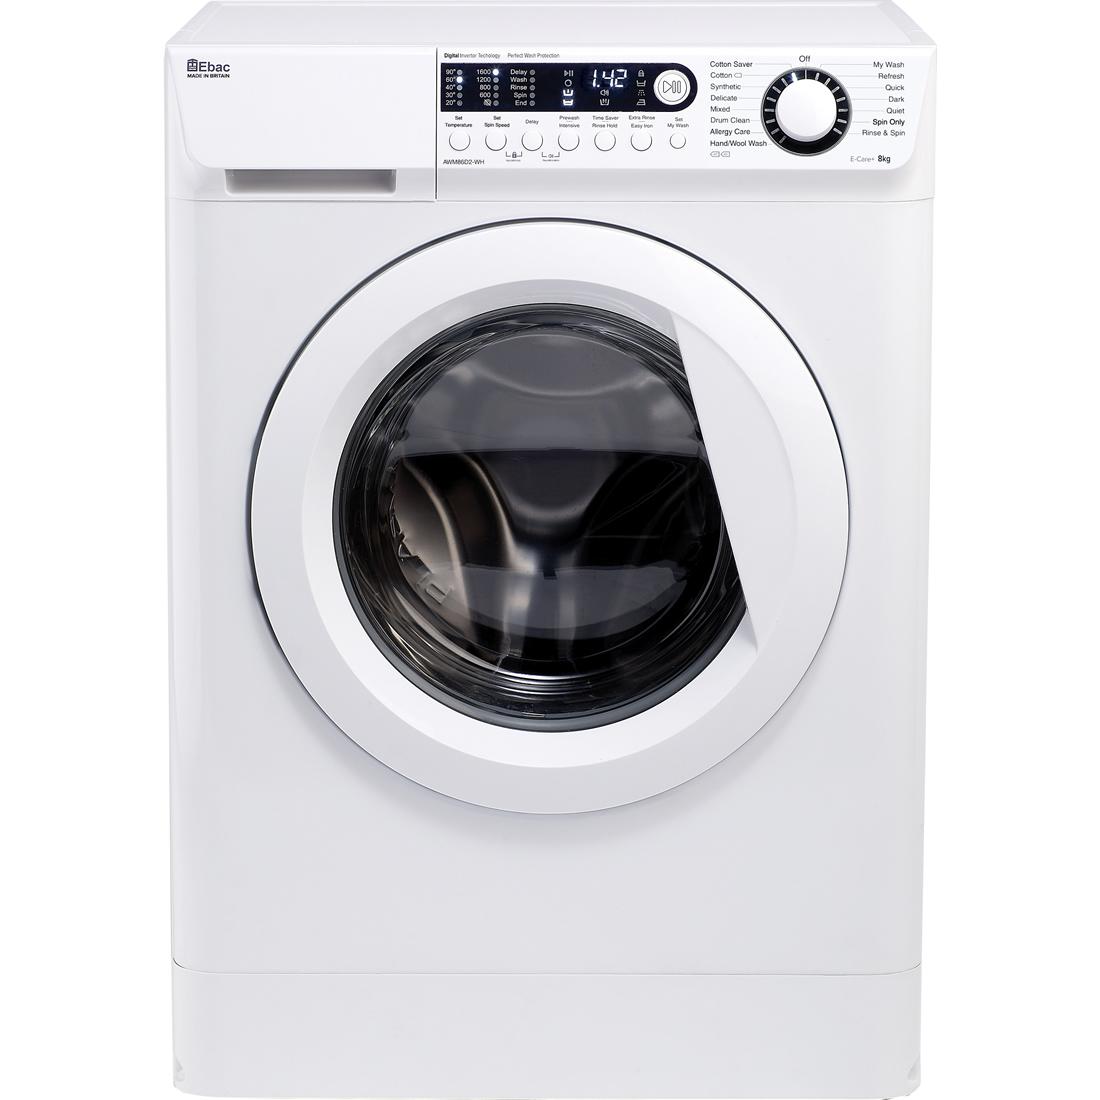 1600rpm Washing Machine 8kg Load Class A+++